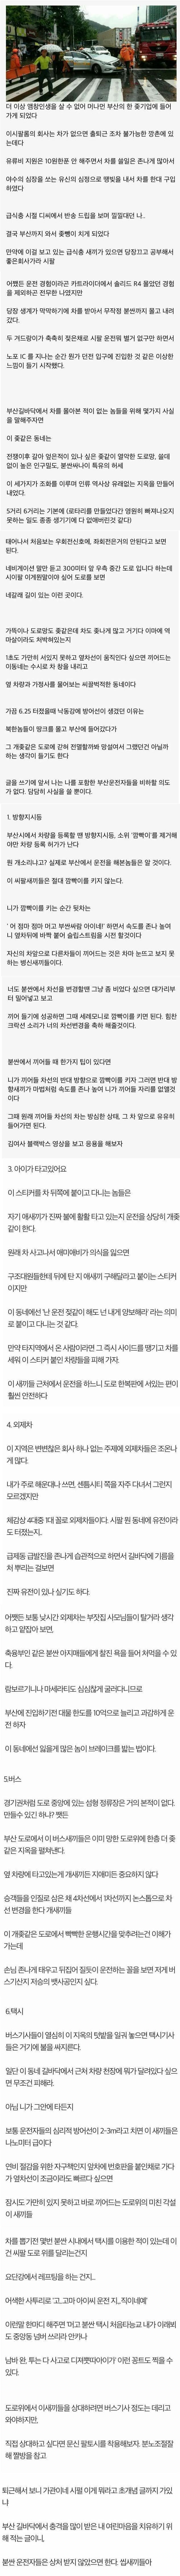 wnsr1482495971.jpg 주갤러의 부산 운전 후기.jpg